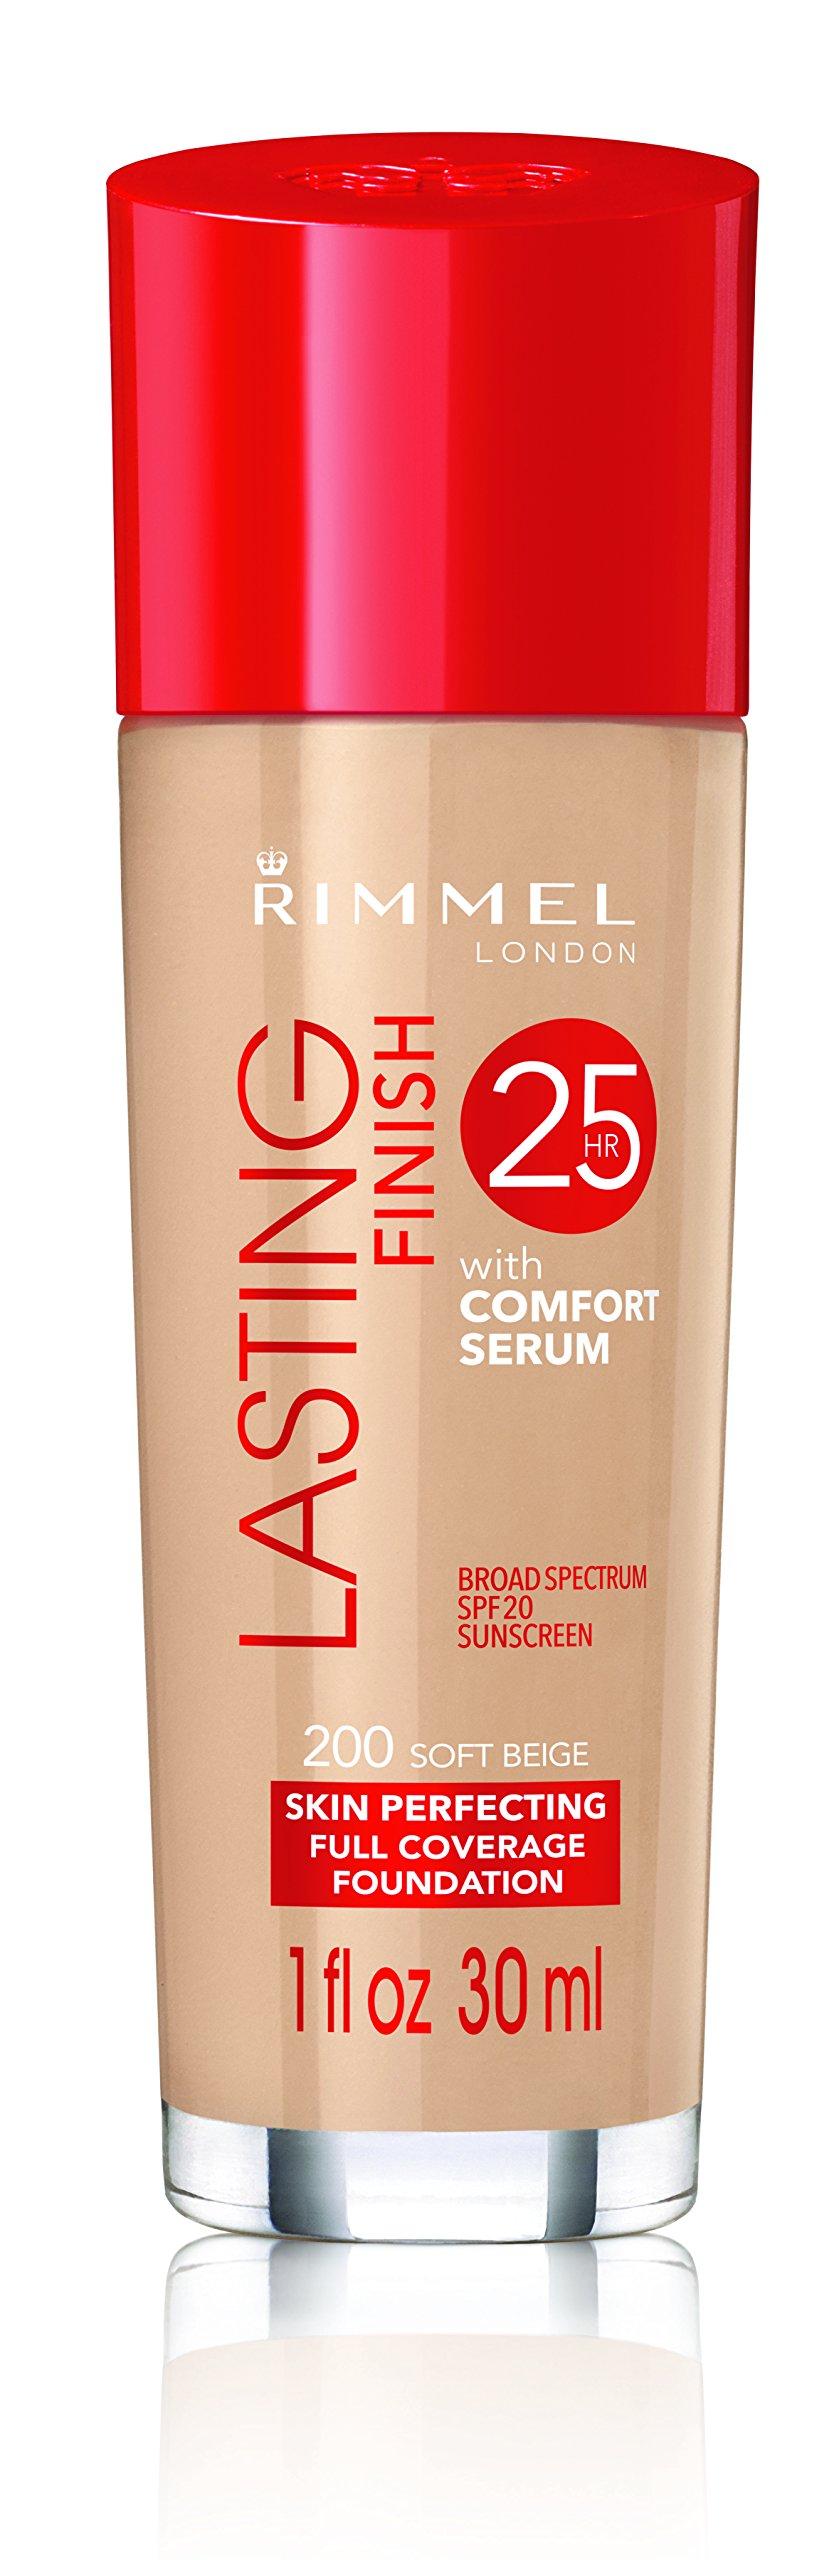 Rimmel Lasting Finish Foundation, Soft Beige, 1 oz., Medium Coverage Liquid Foundation with SPF 20, Long Lasting Smooth & Even Look